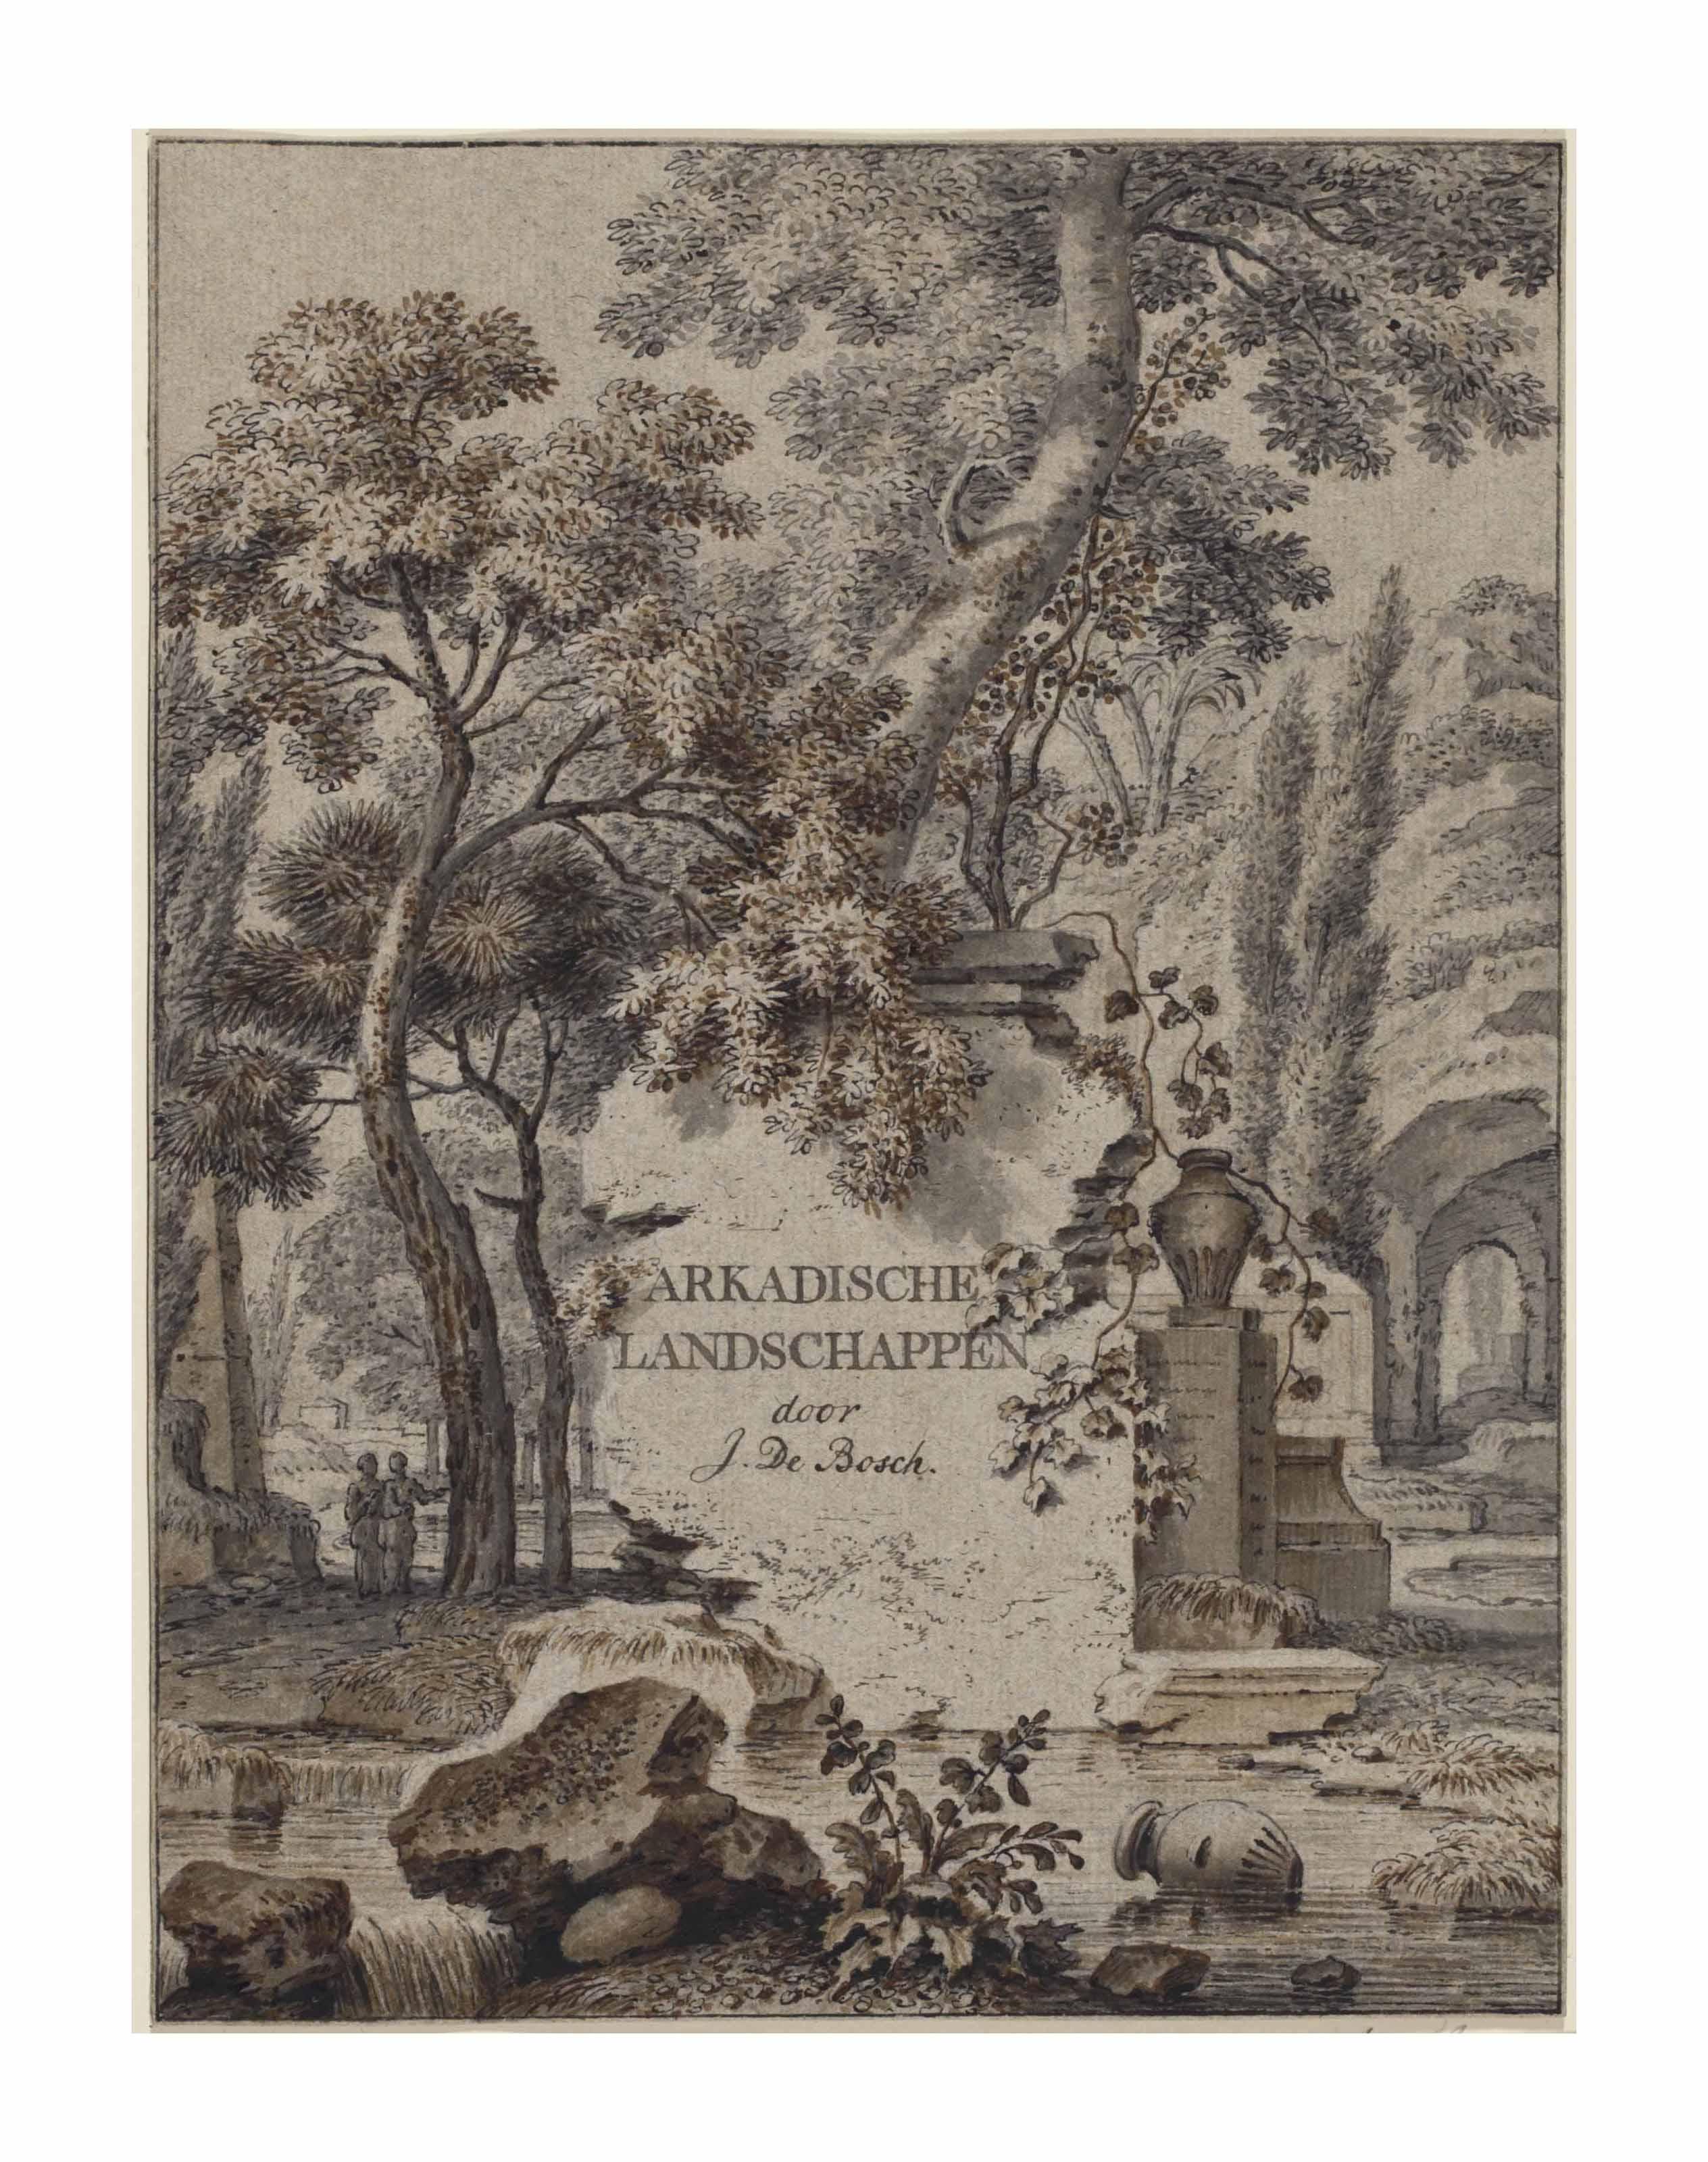 Design for a title page: 'Arkadische landschappen'